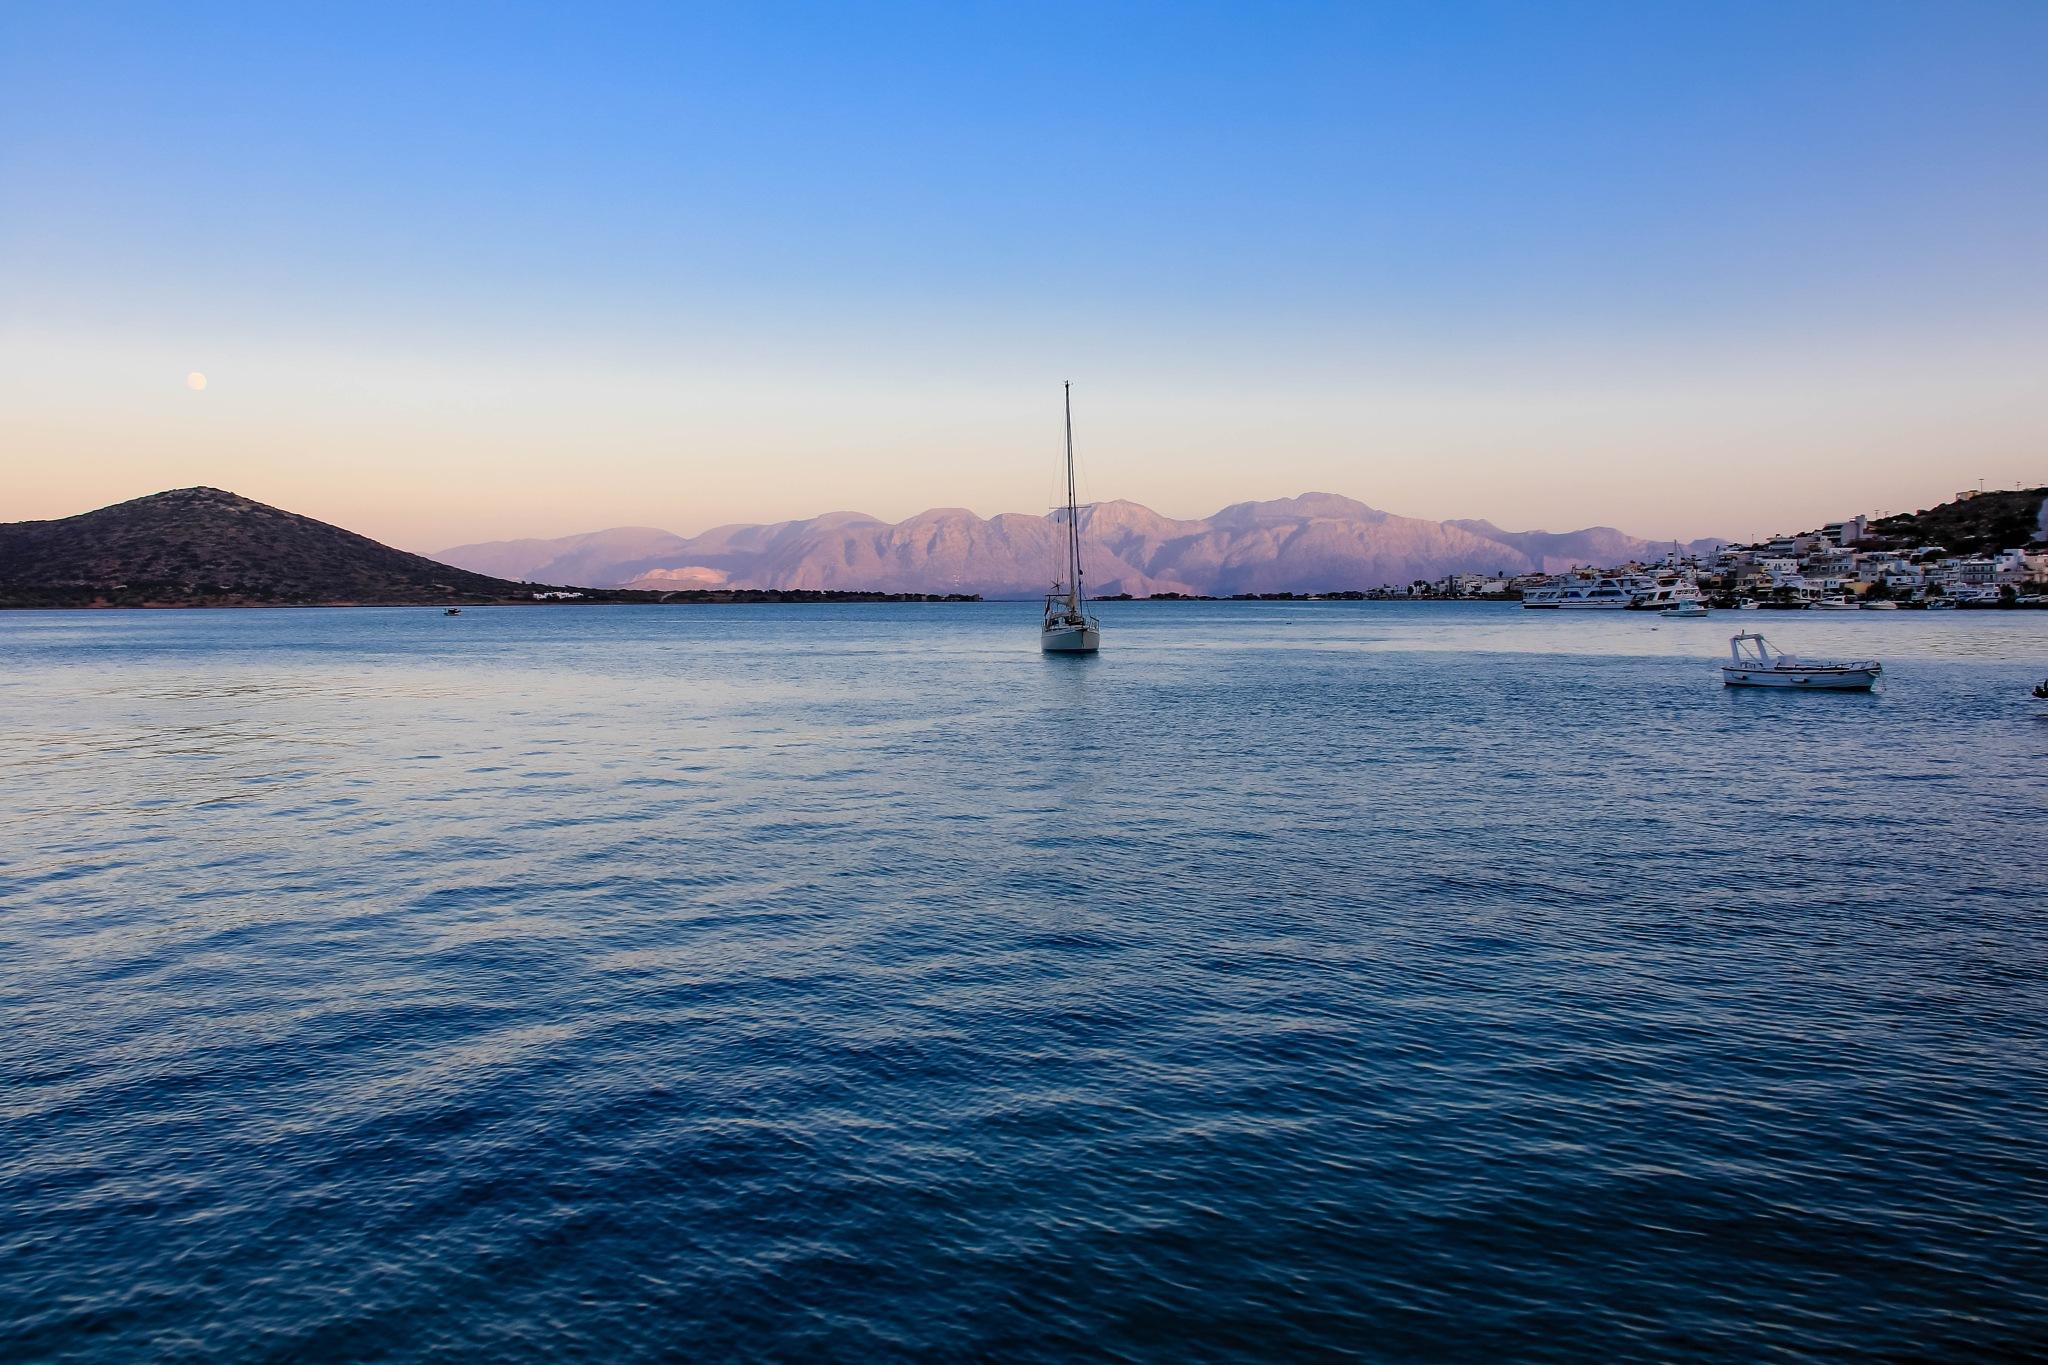 Boats at Dusk by Martin Roper